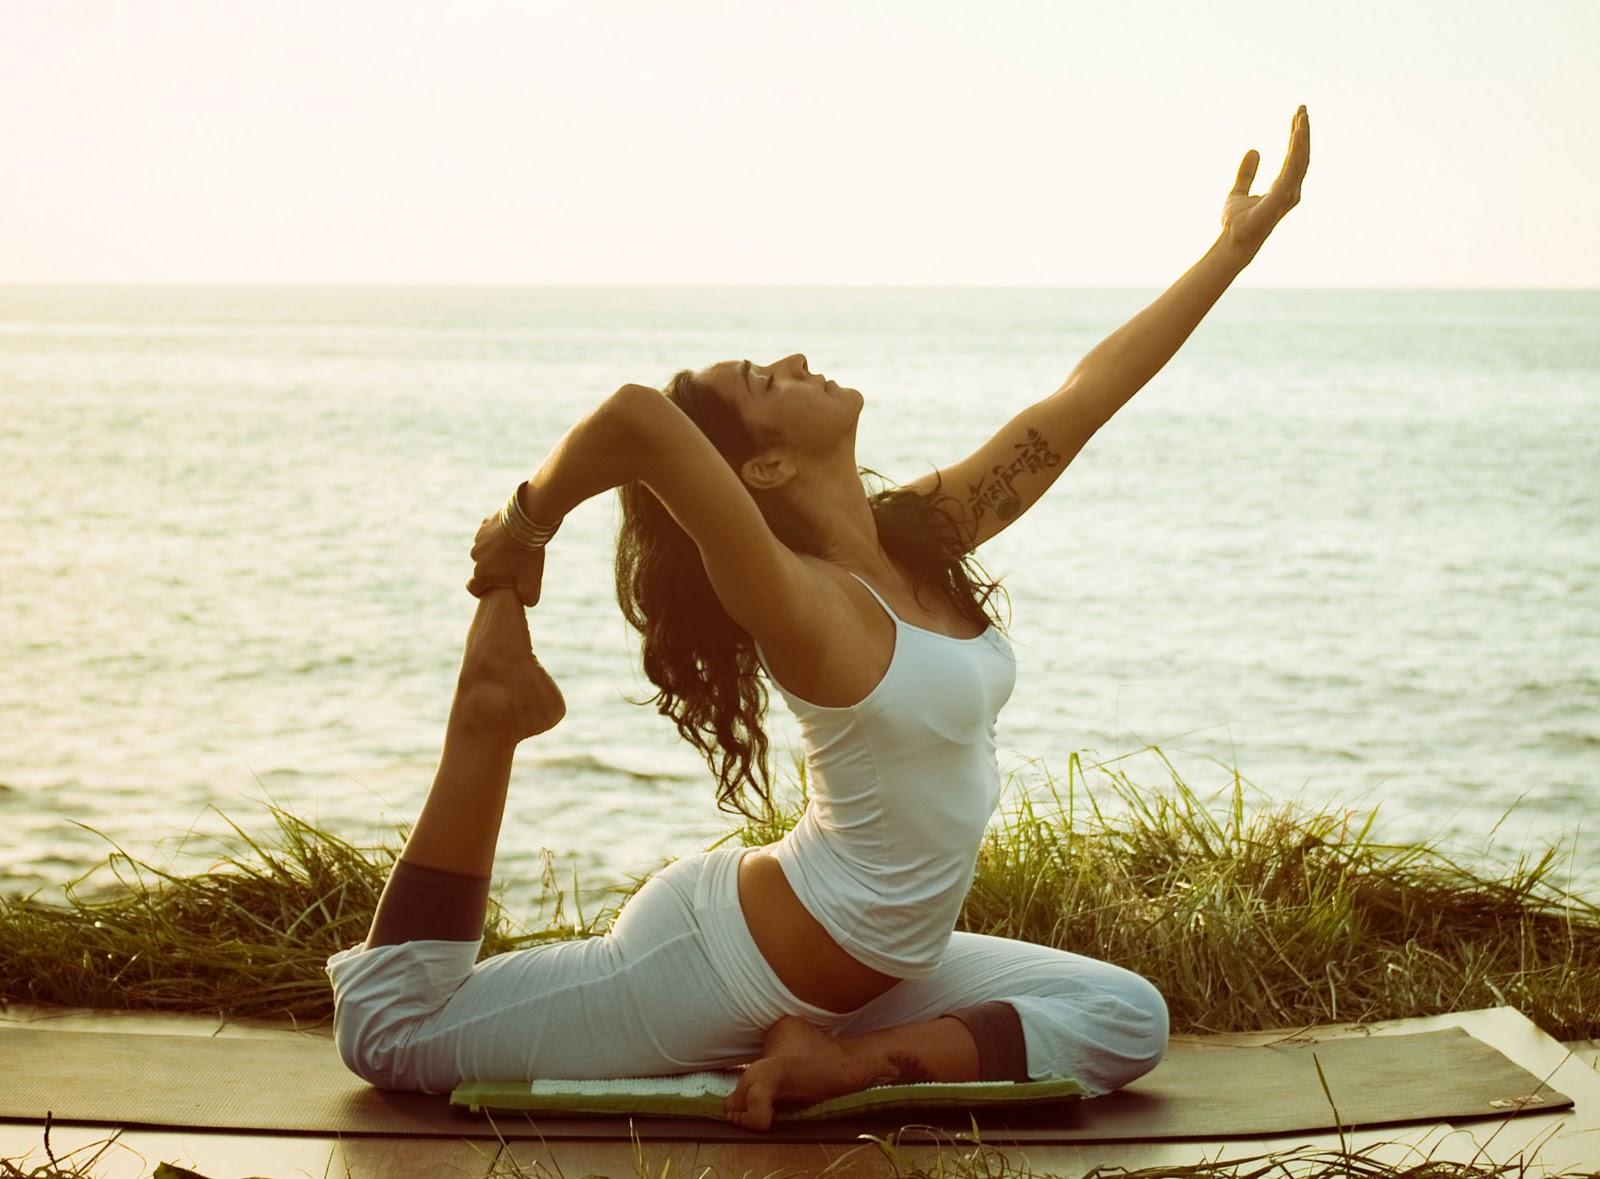 Chica practicando yoga